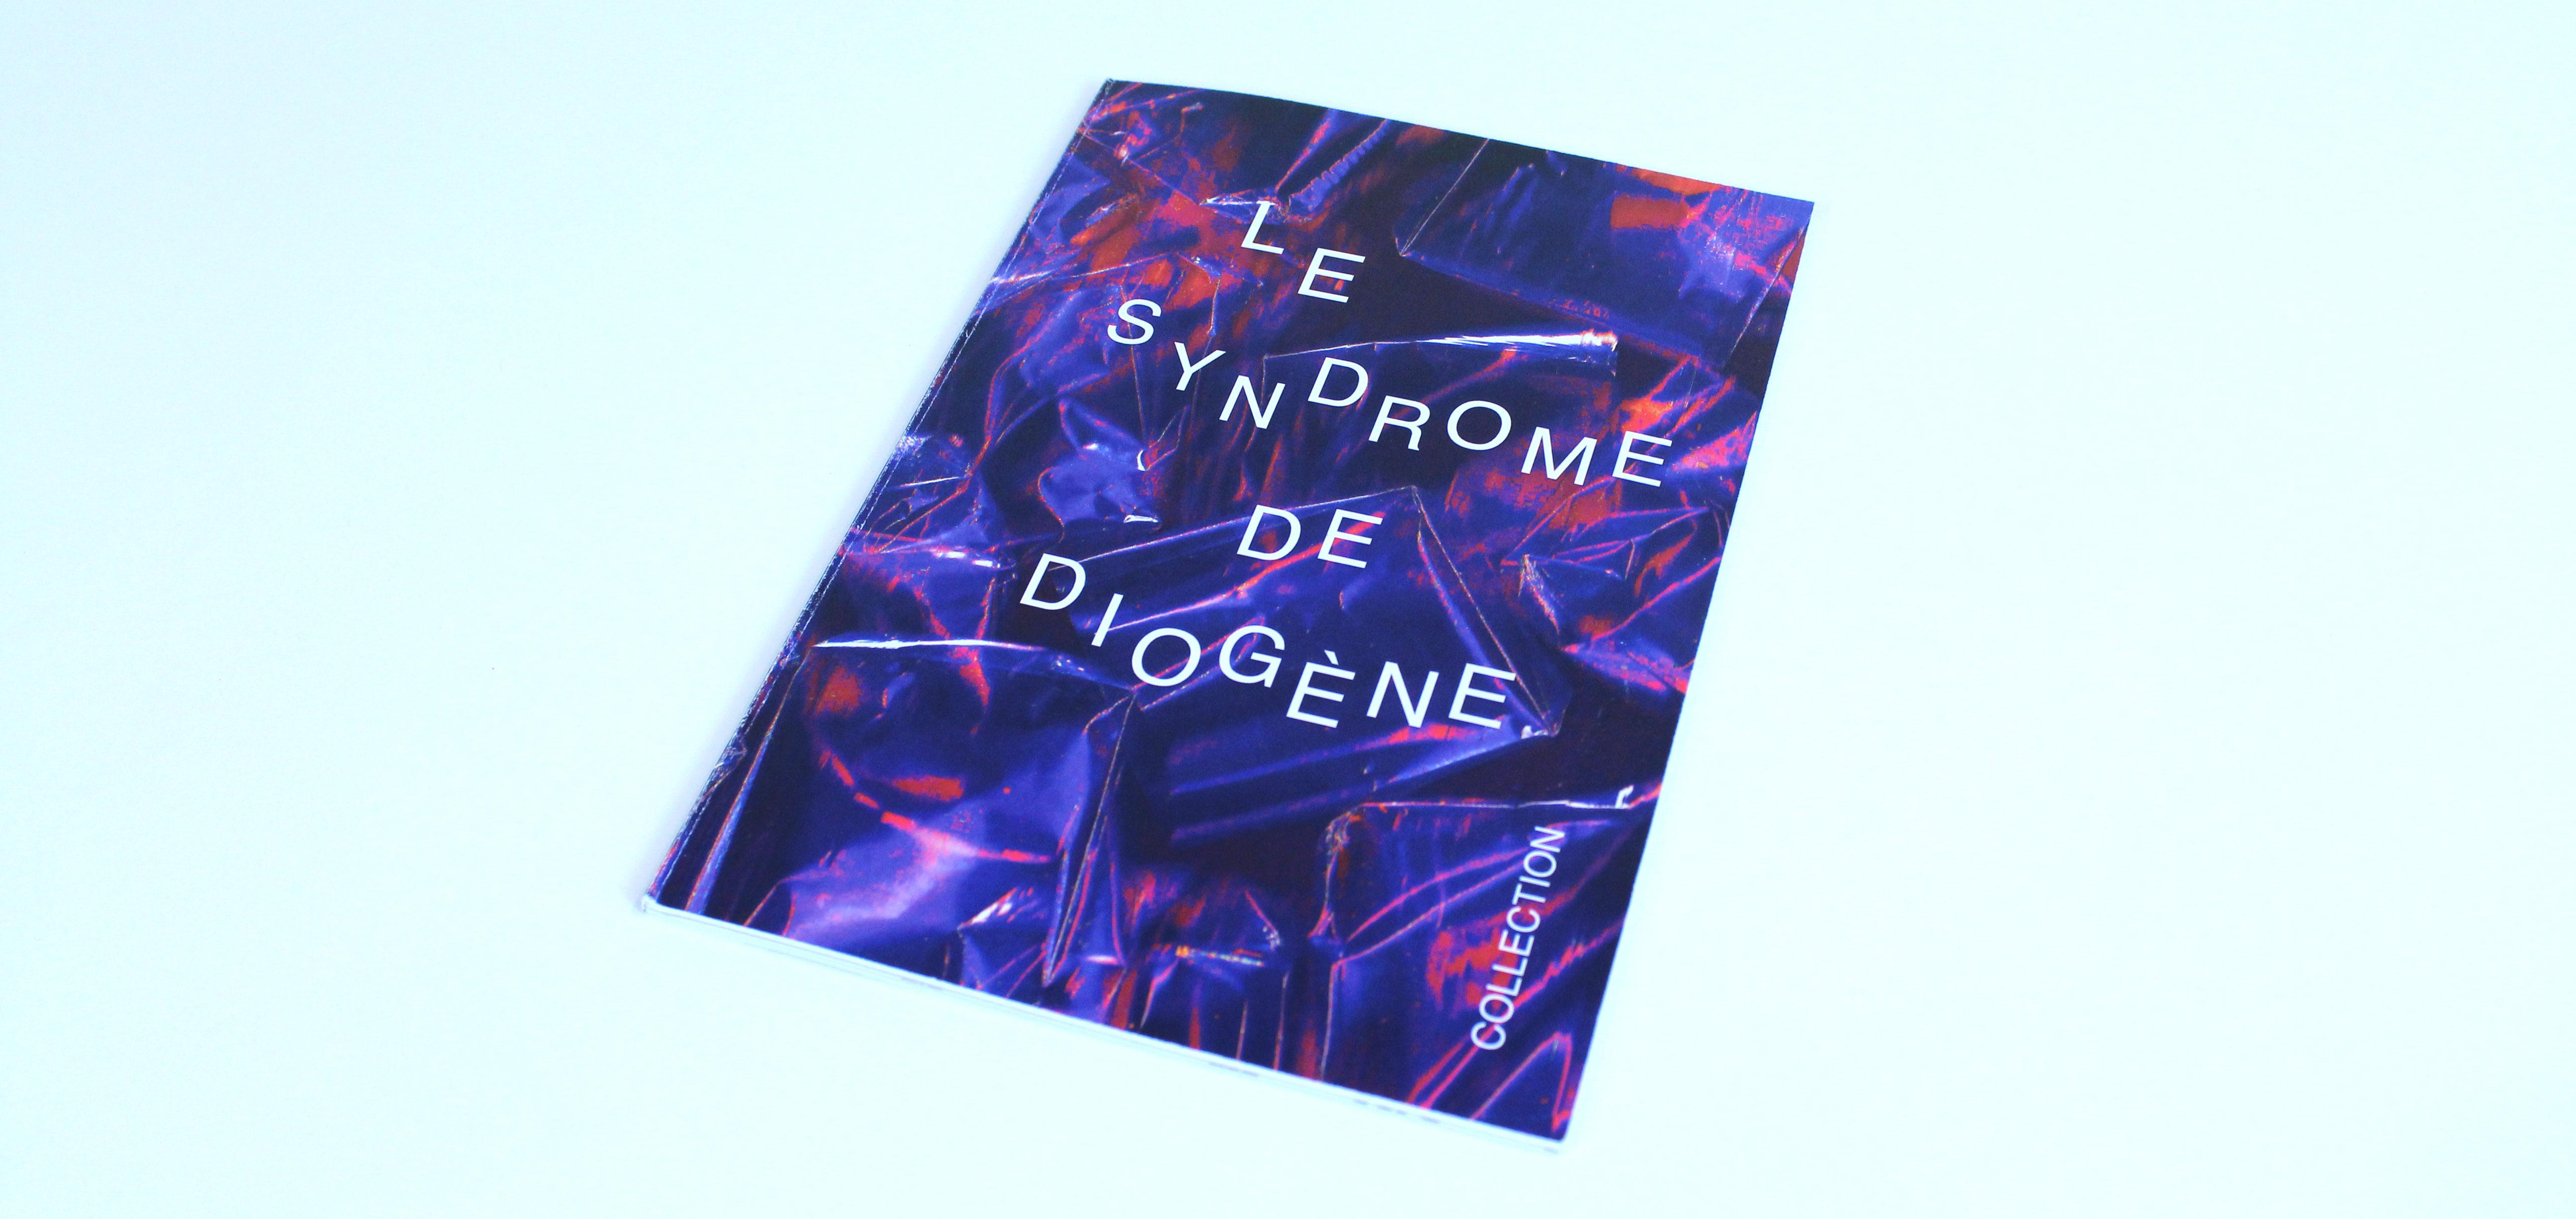 Diogene-1